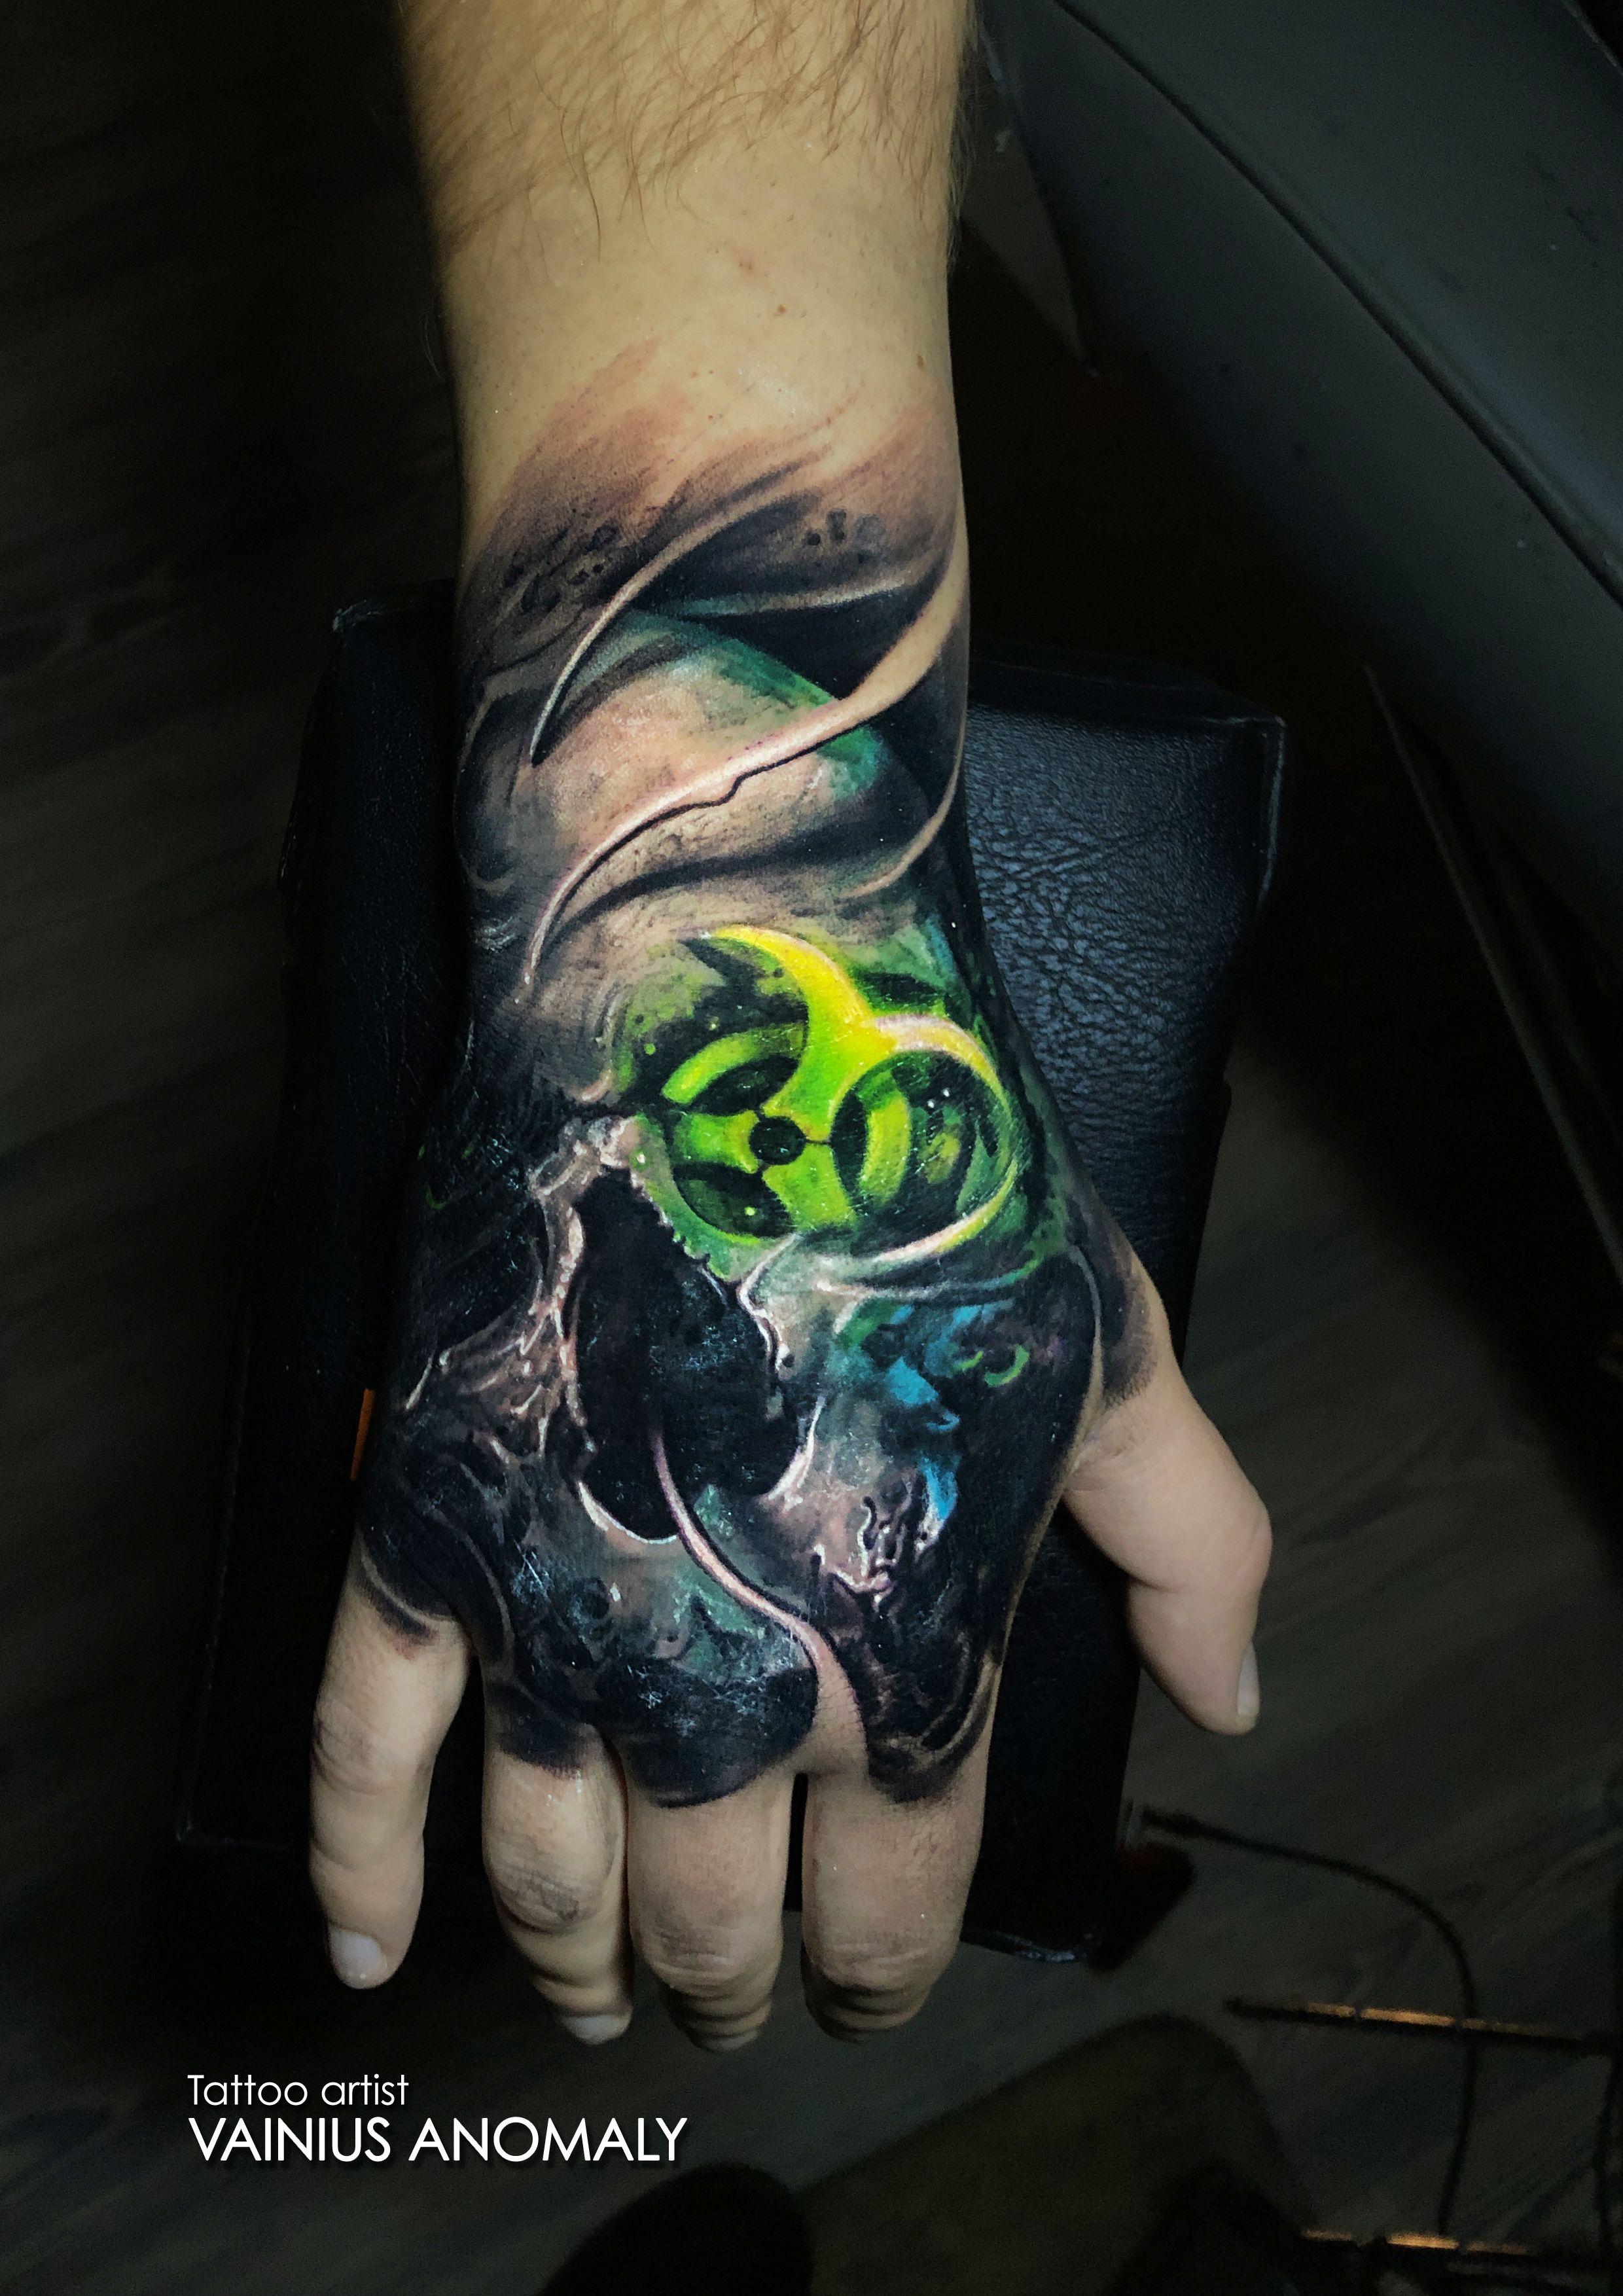 Tattoo Done By Vainius Anomaly Please Don T Copy Follow Http Www Instagram Com Vainius Art Http Www Facebook C Tattoos Hand Tattoos Buddha Tattoo Design